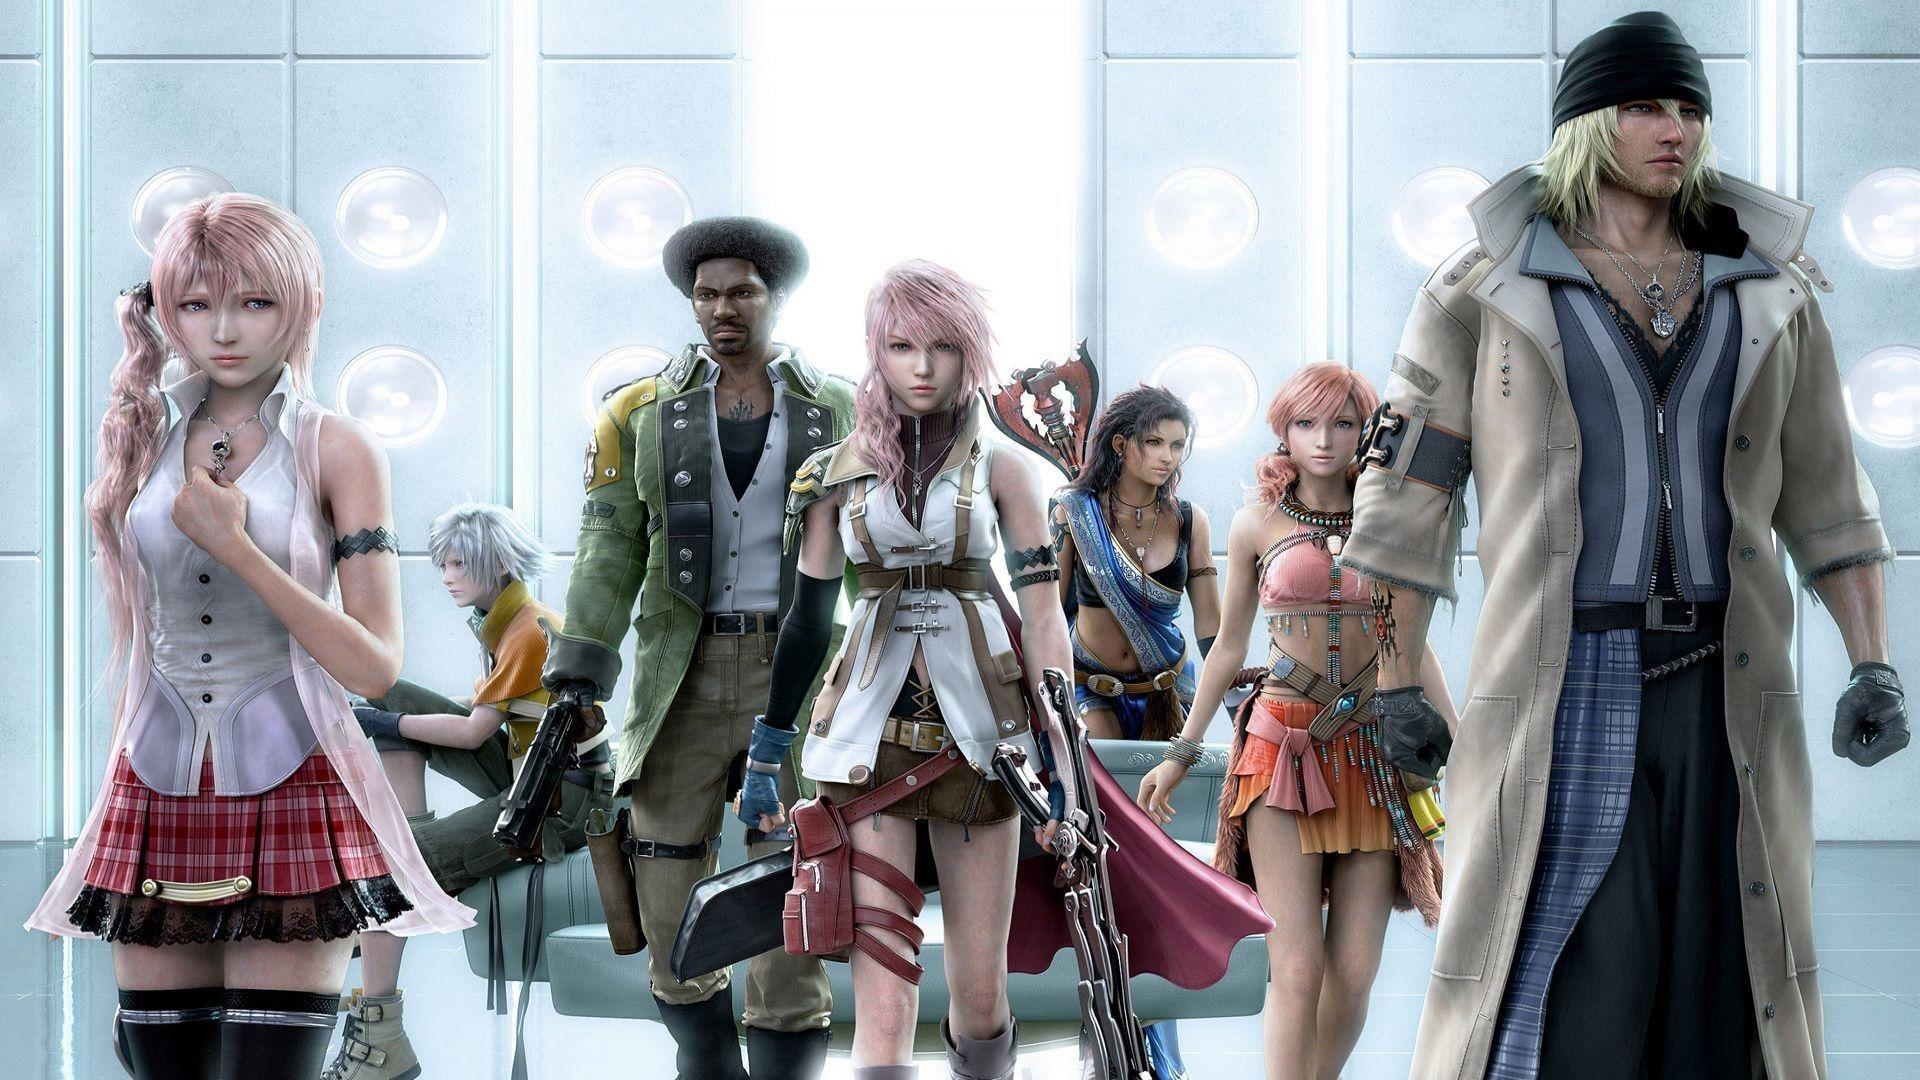 FFXIII Characters - Characters & Art - Final Fantasy XIII